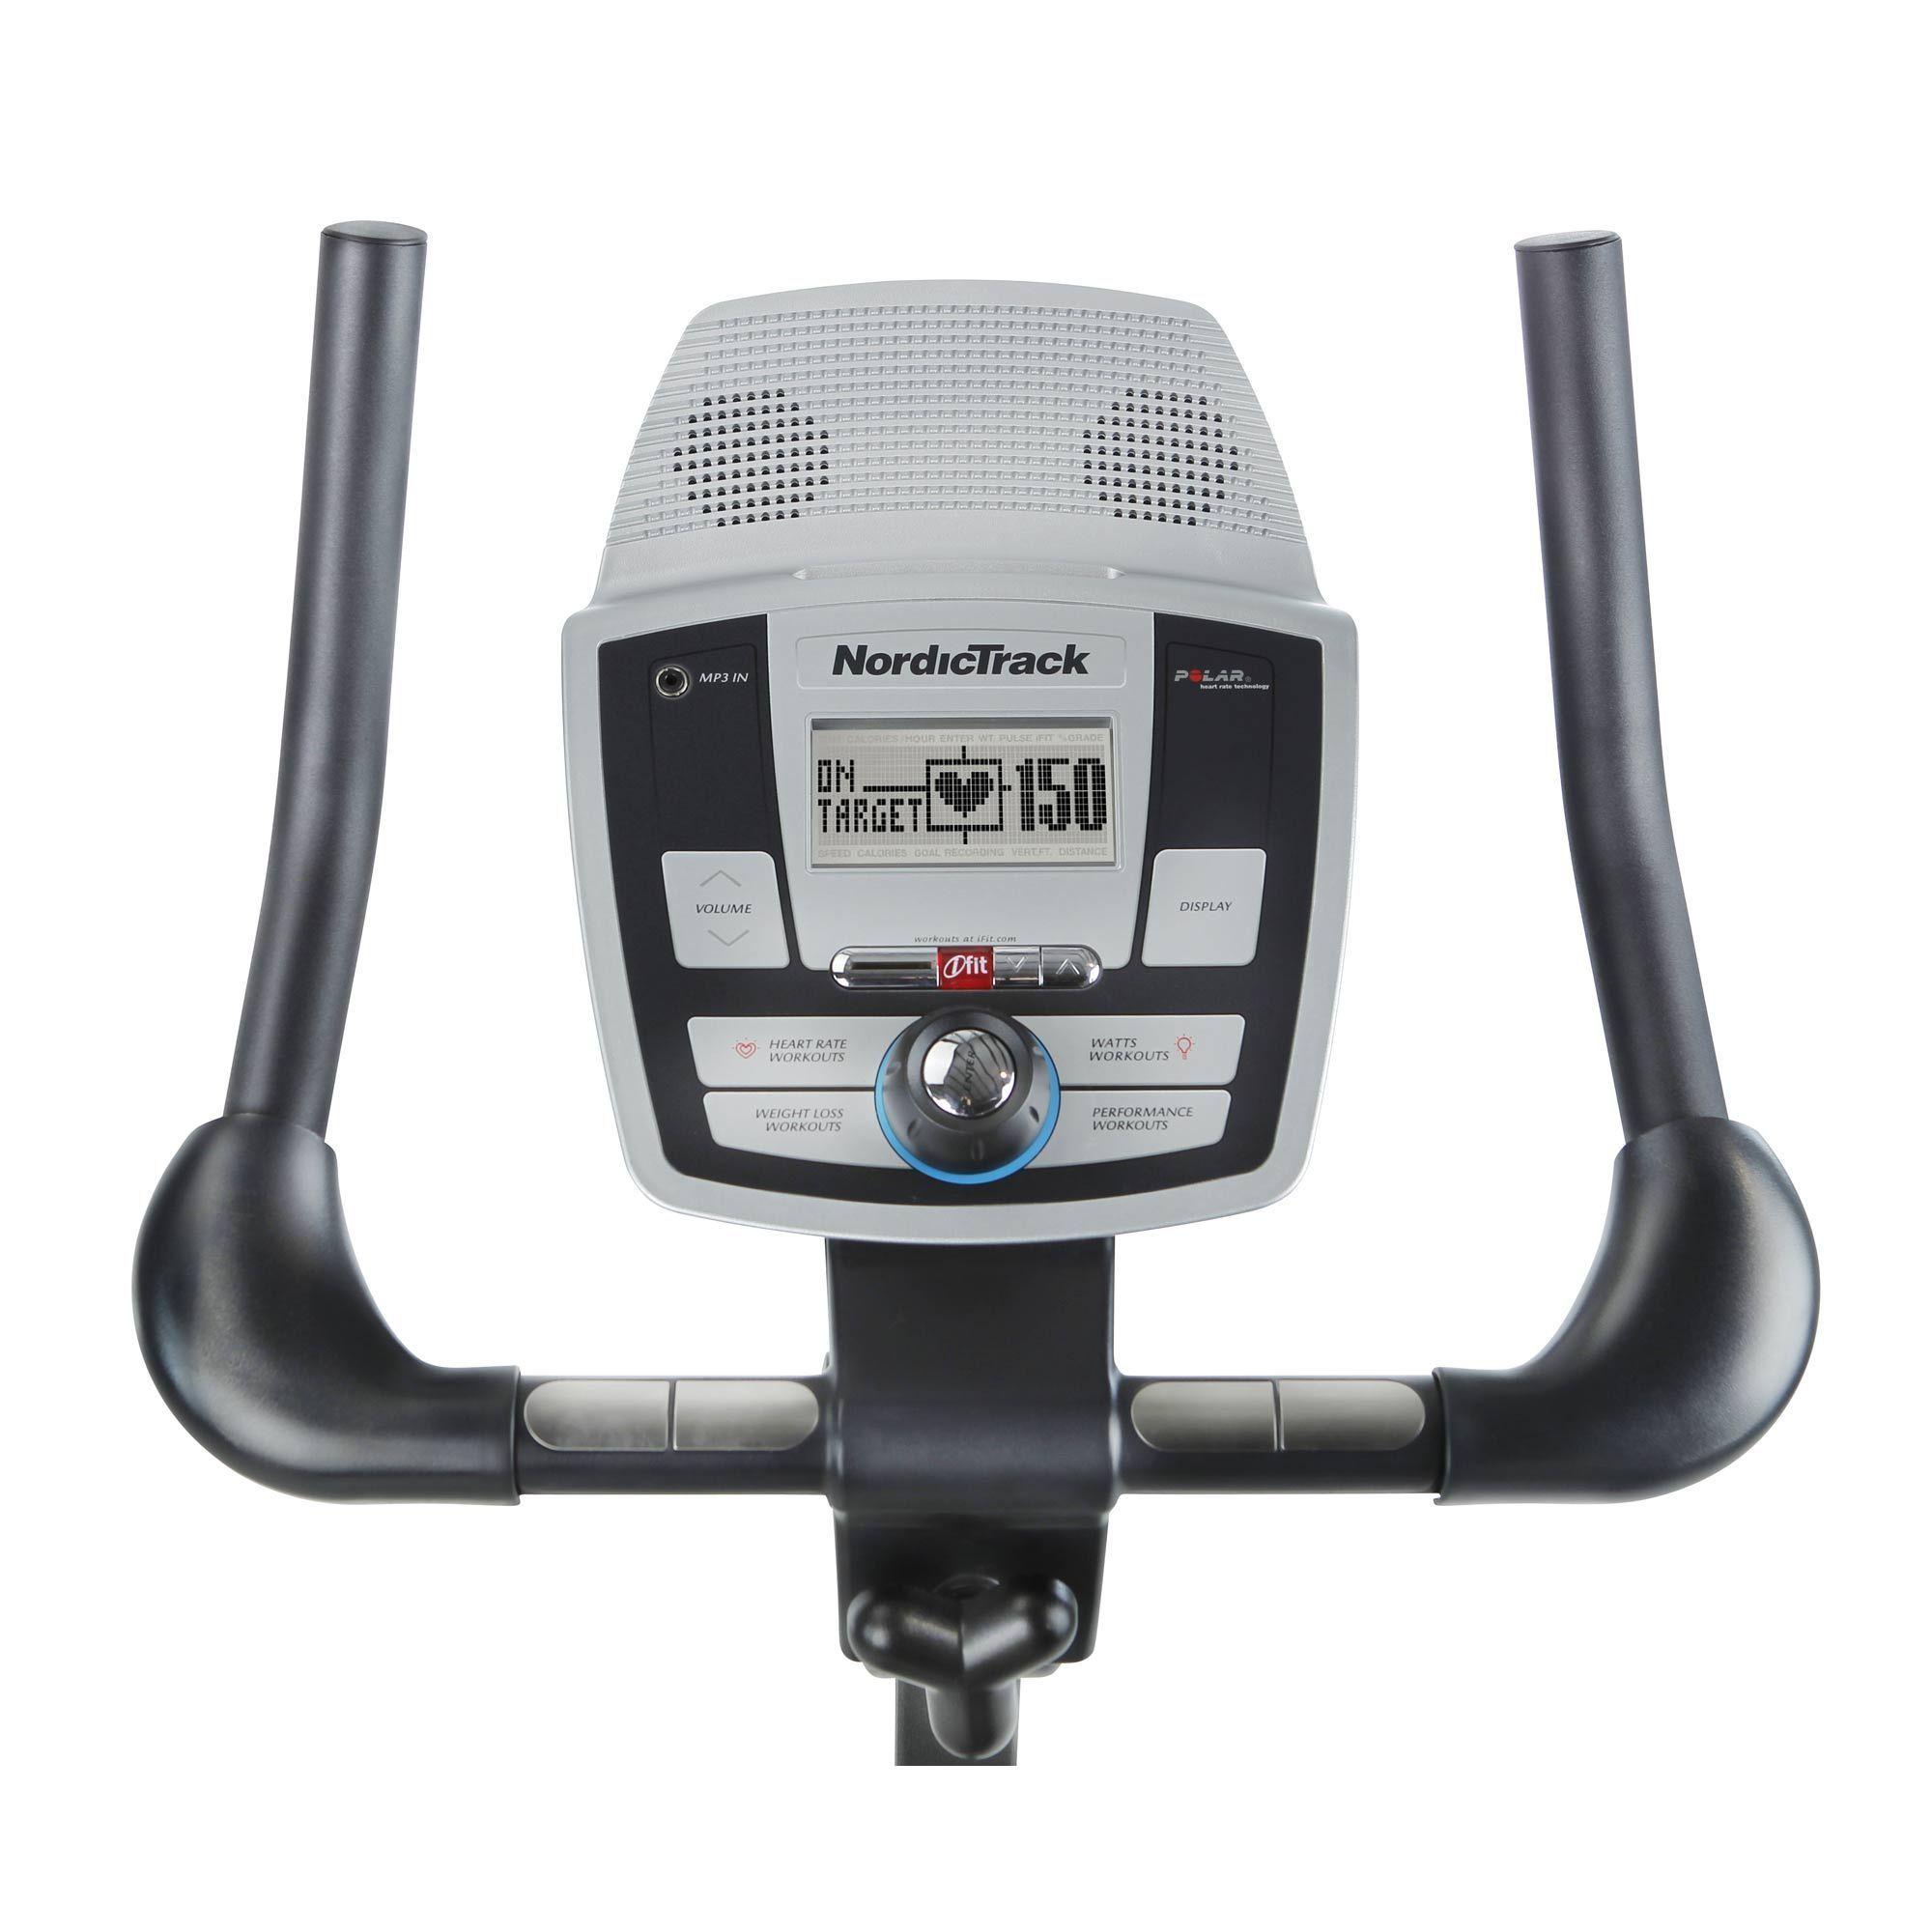 Nordictrack T14 Treadmill: NordicTrack Complete Fitness Set